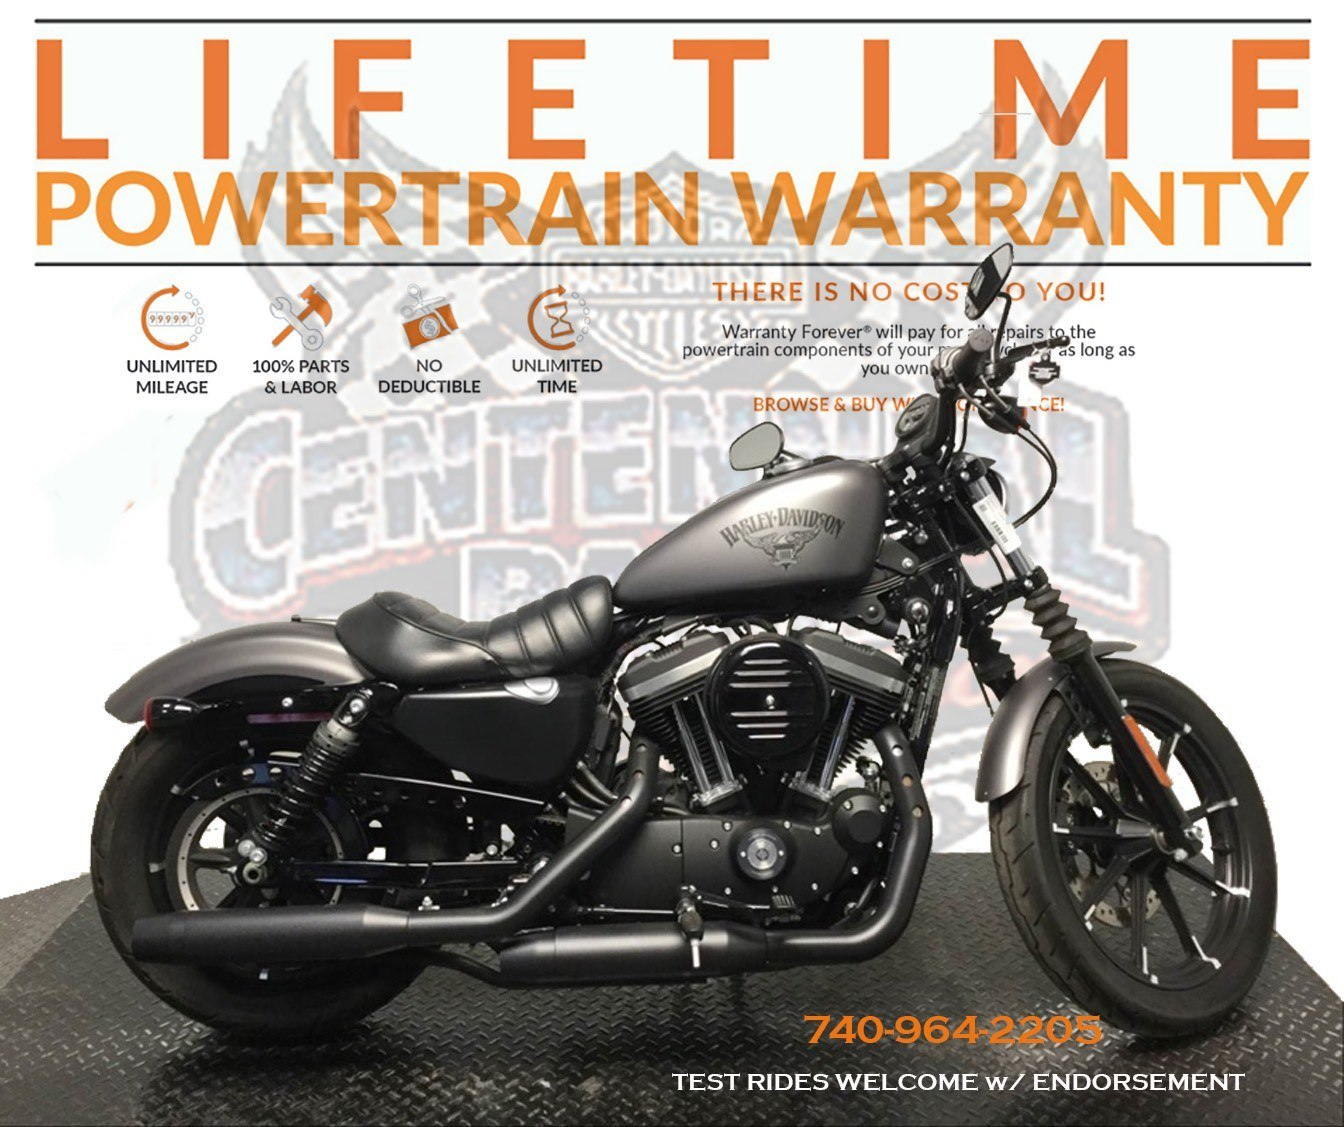 Harley Davidson Used >> 2017 Harley Davidson Iron 883 In Sunbury Ohio